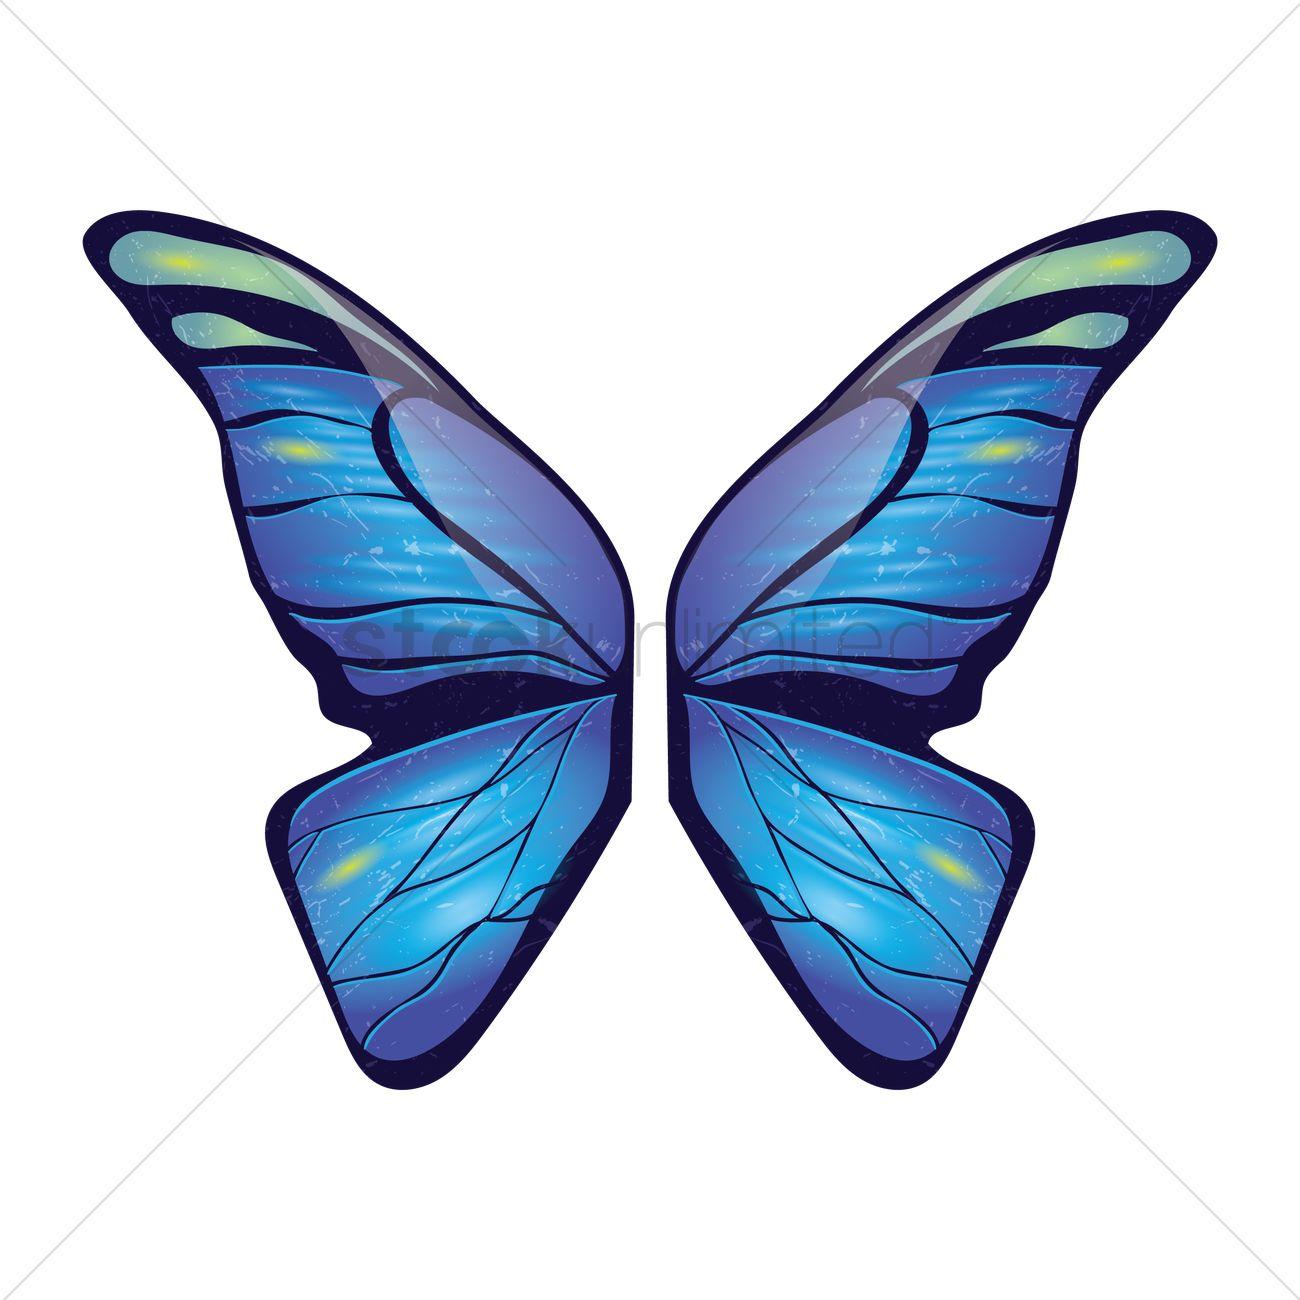 Butterfly designs